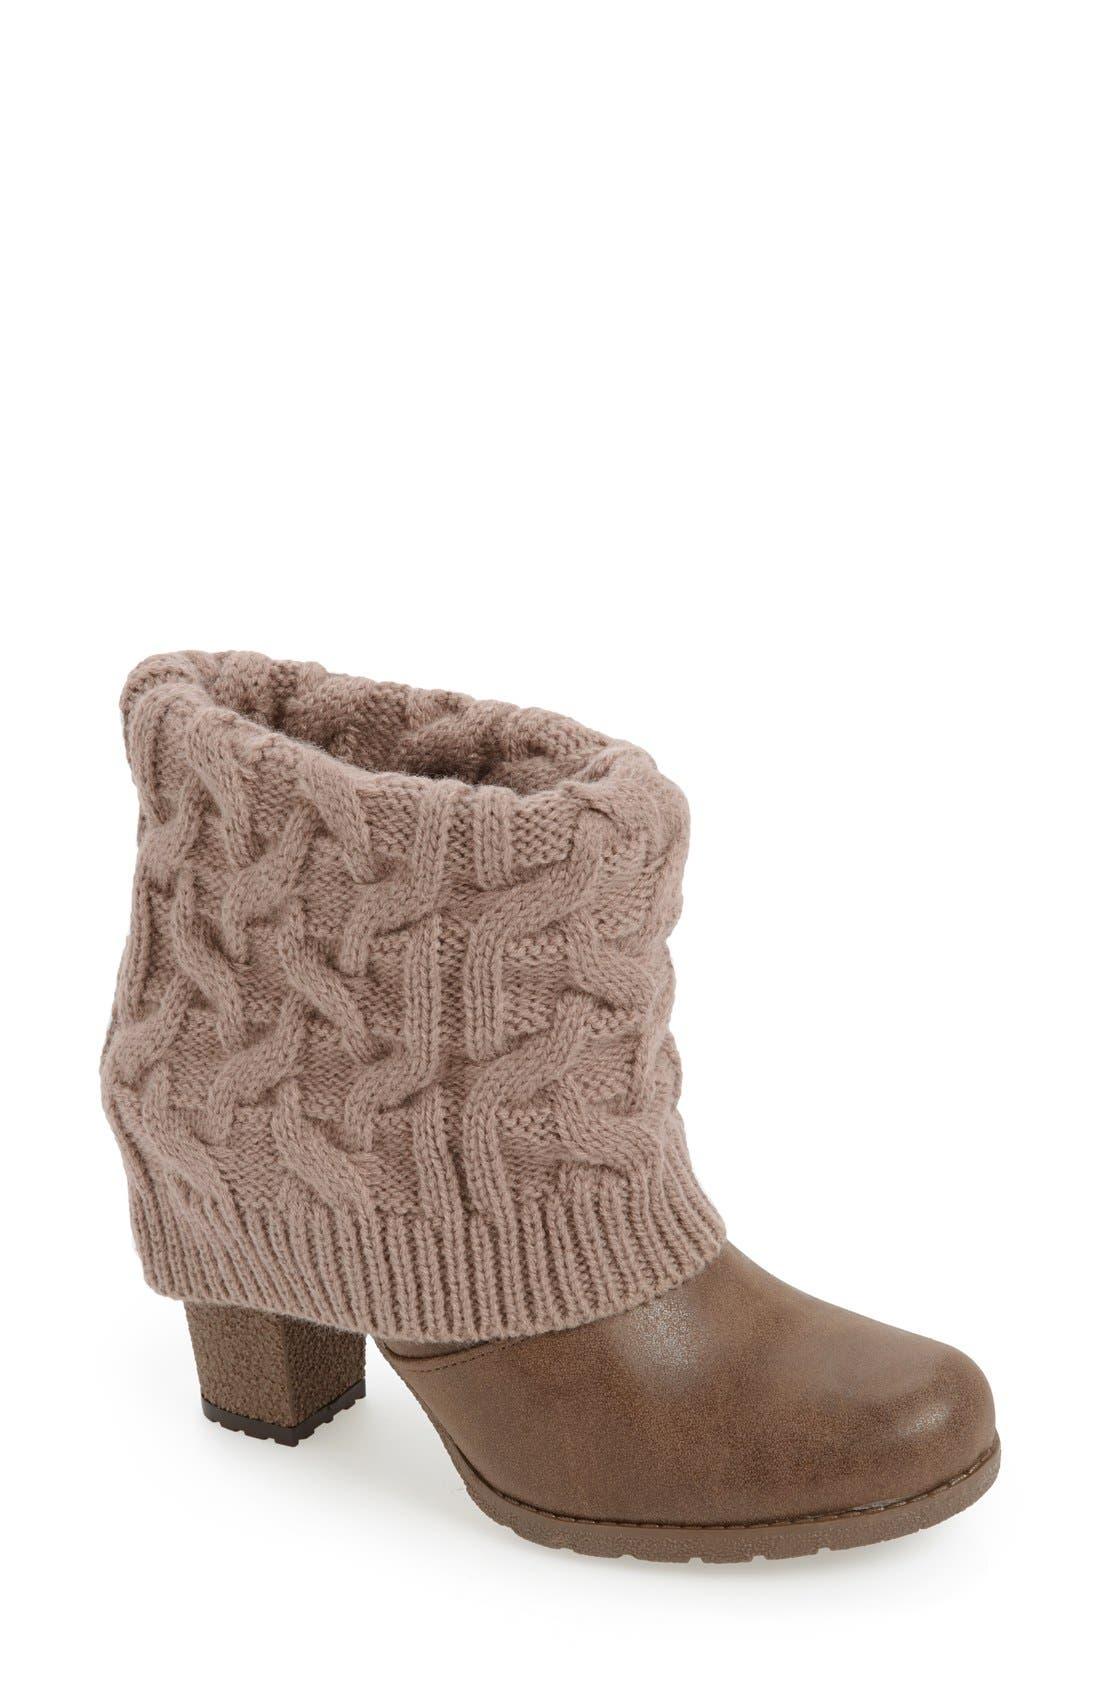 Main Image - MUK LUKS 'Chris' Knit Cuff Bootie (Women)